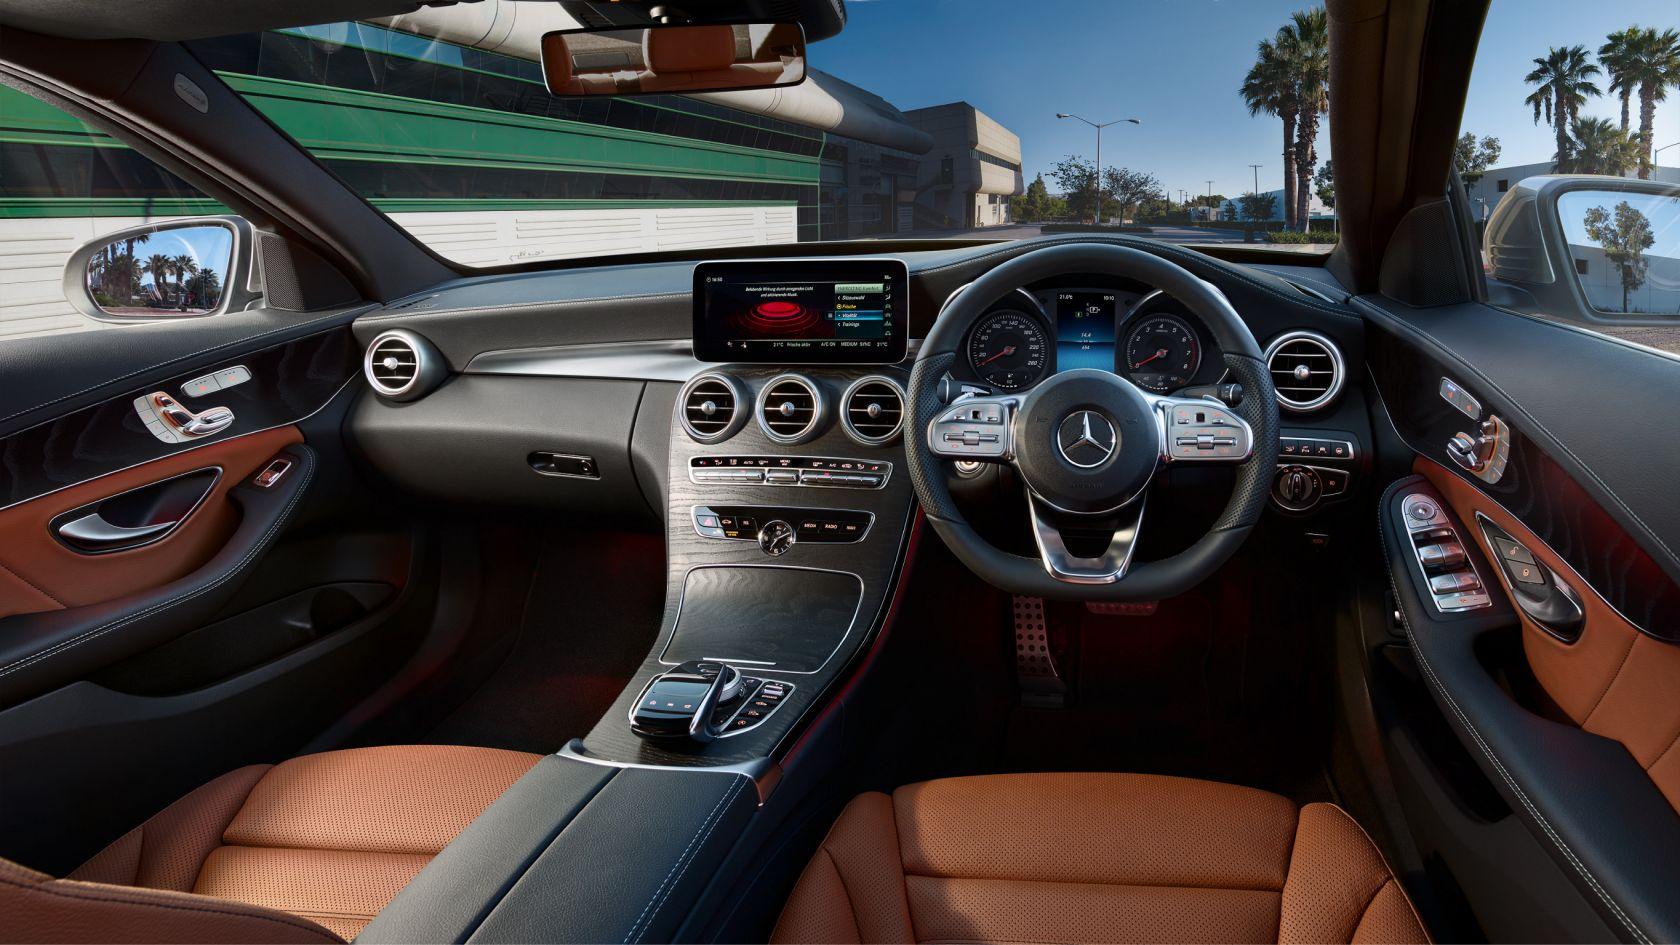 Mercedes Benz C-Class cabin india